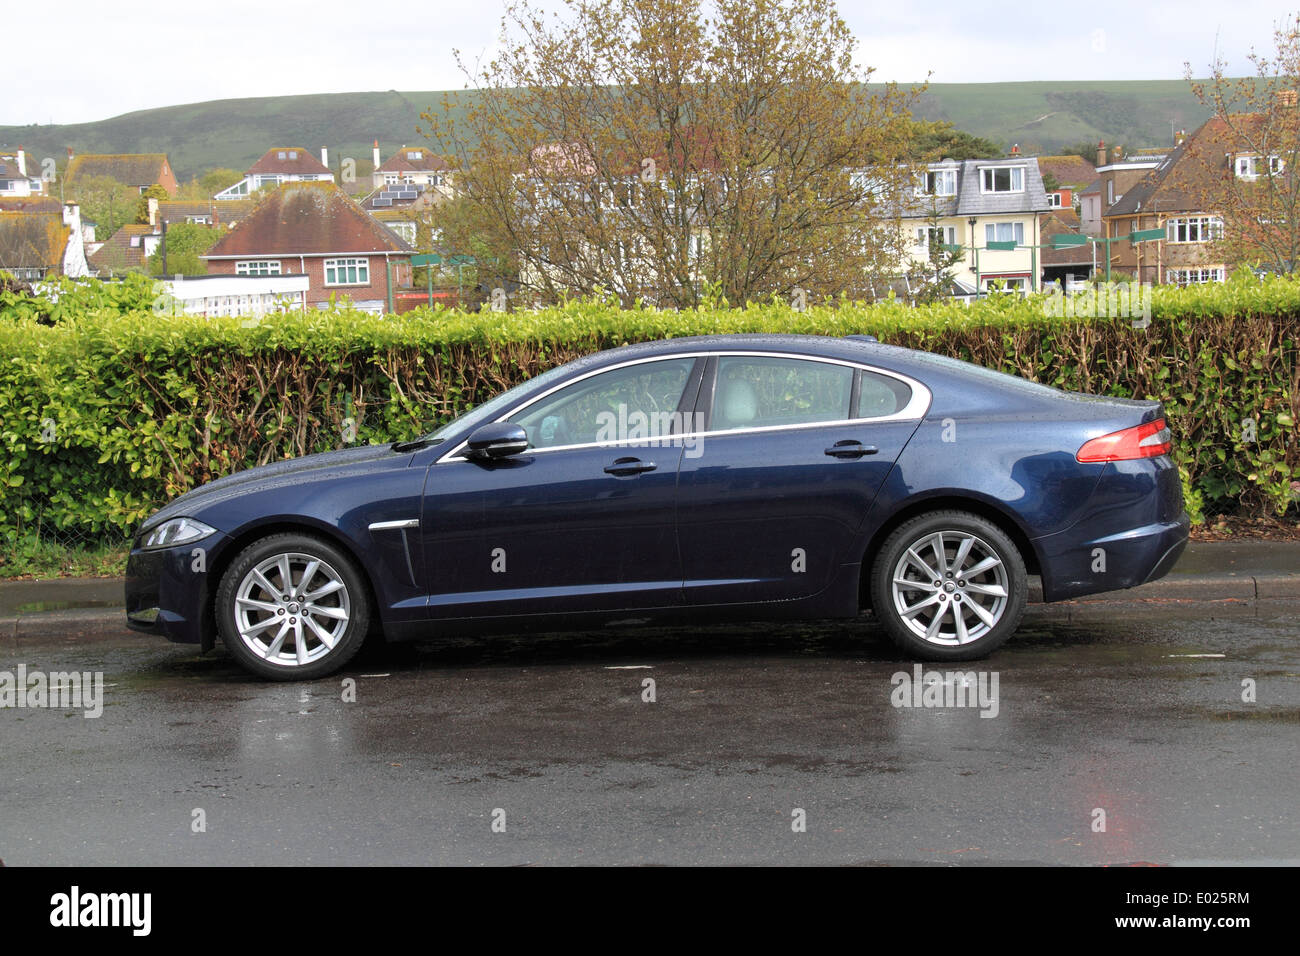 Jaguar XF 2.2D Premium Luxury (2012 style update), Surrey, England, Great Britain, United Kingdom, UK, Europe - Stock Image